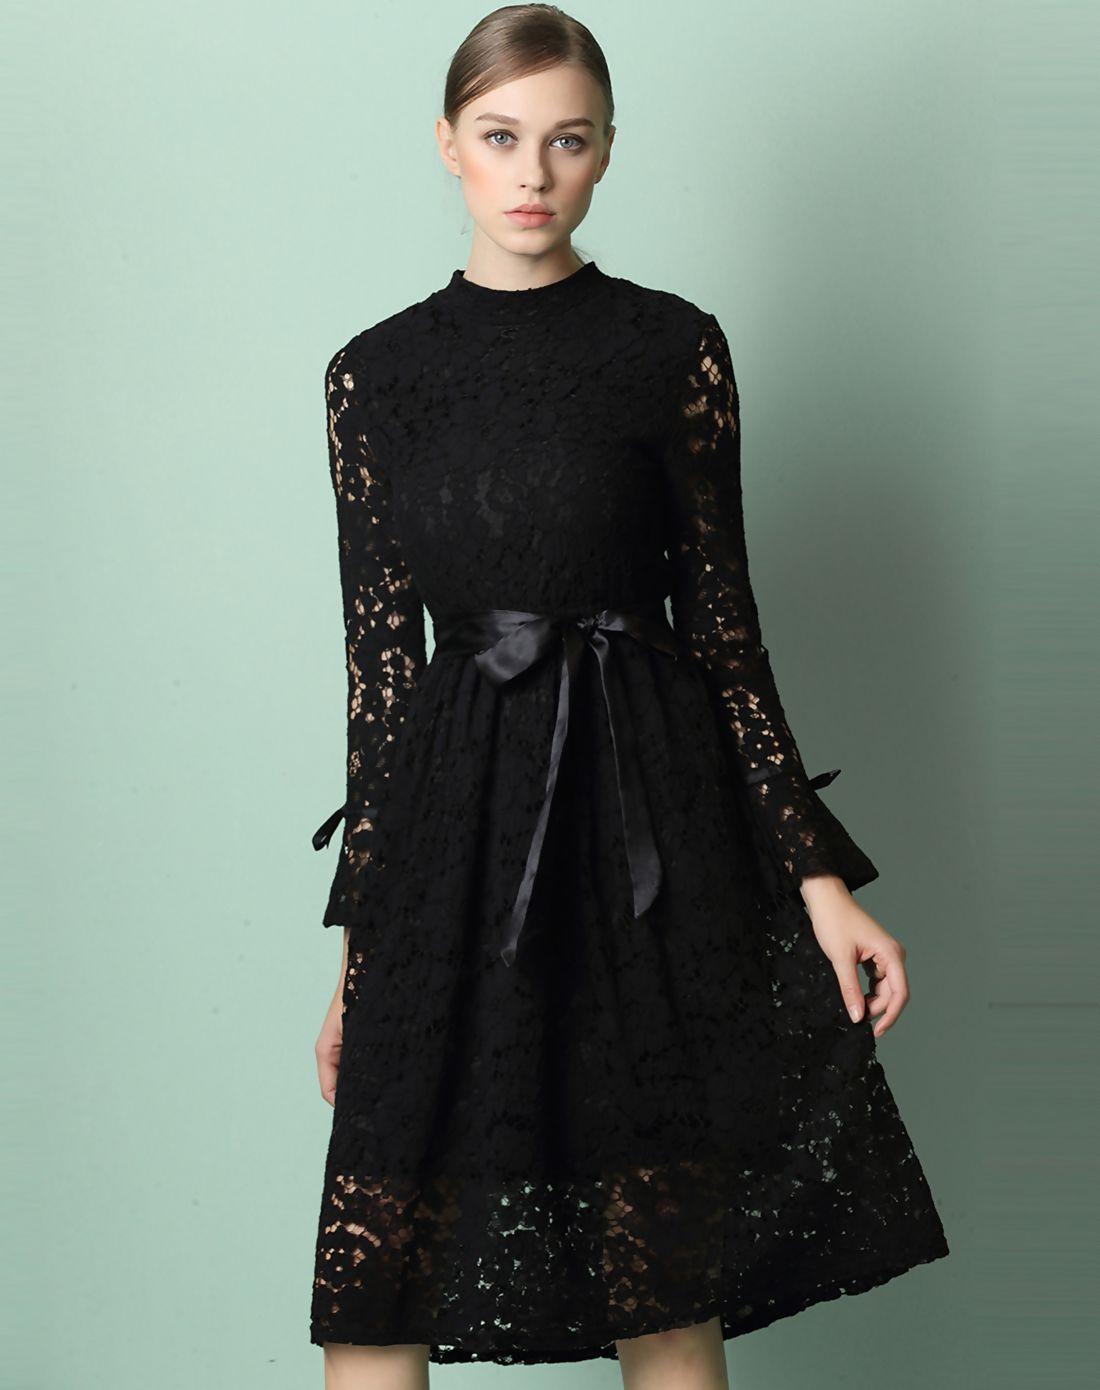 #AdoreWe #VIPme A-Line Dresses - Designer yimei Black Stand Collar Long Sleeve Lace Sheath Dress - AdoreWe.com